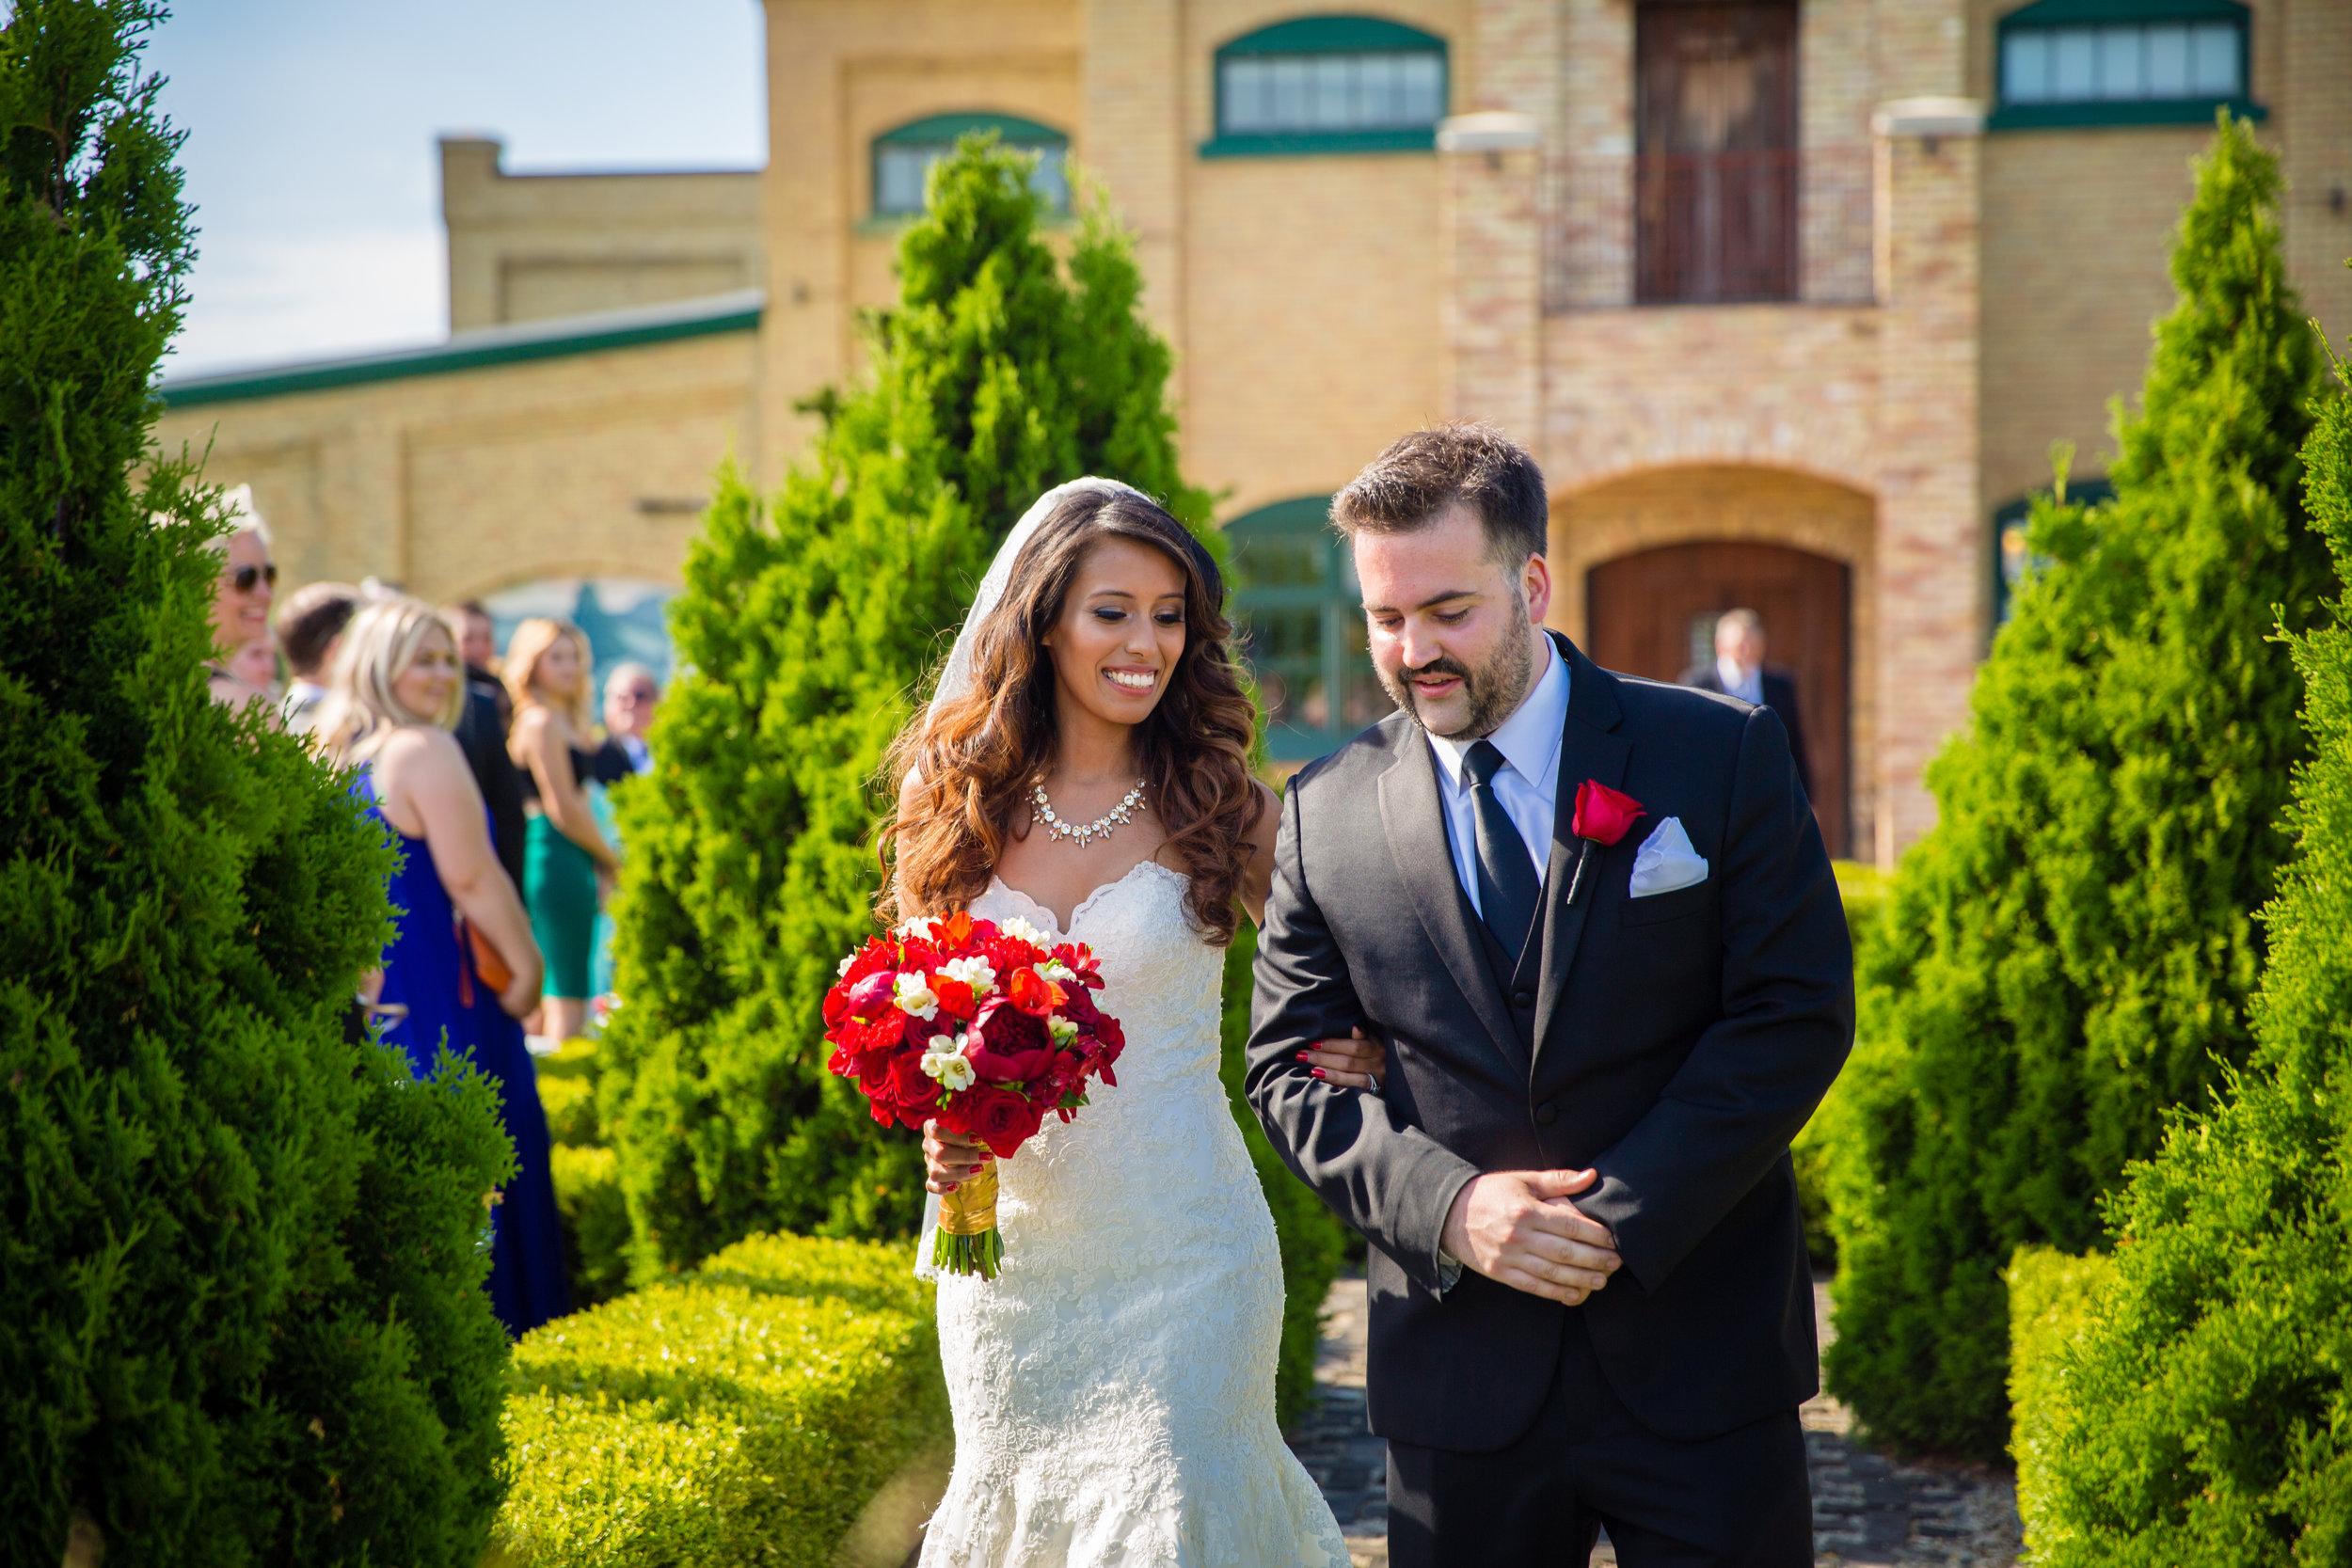 GALLANT-WEDDING_JUNE4-2016-1445.jpg